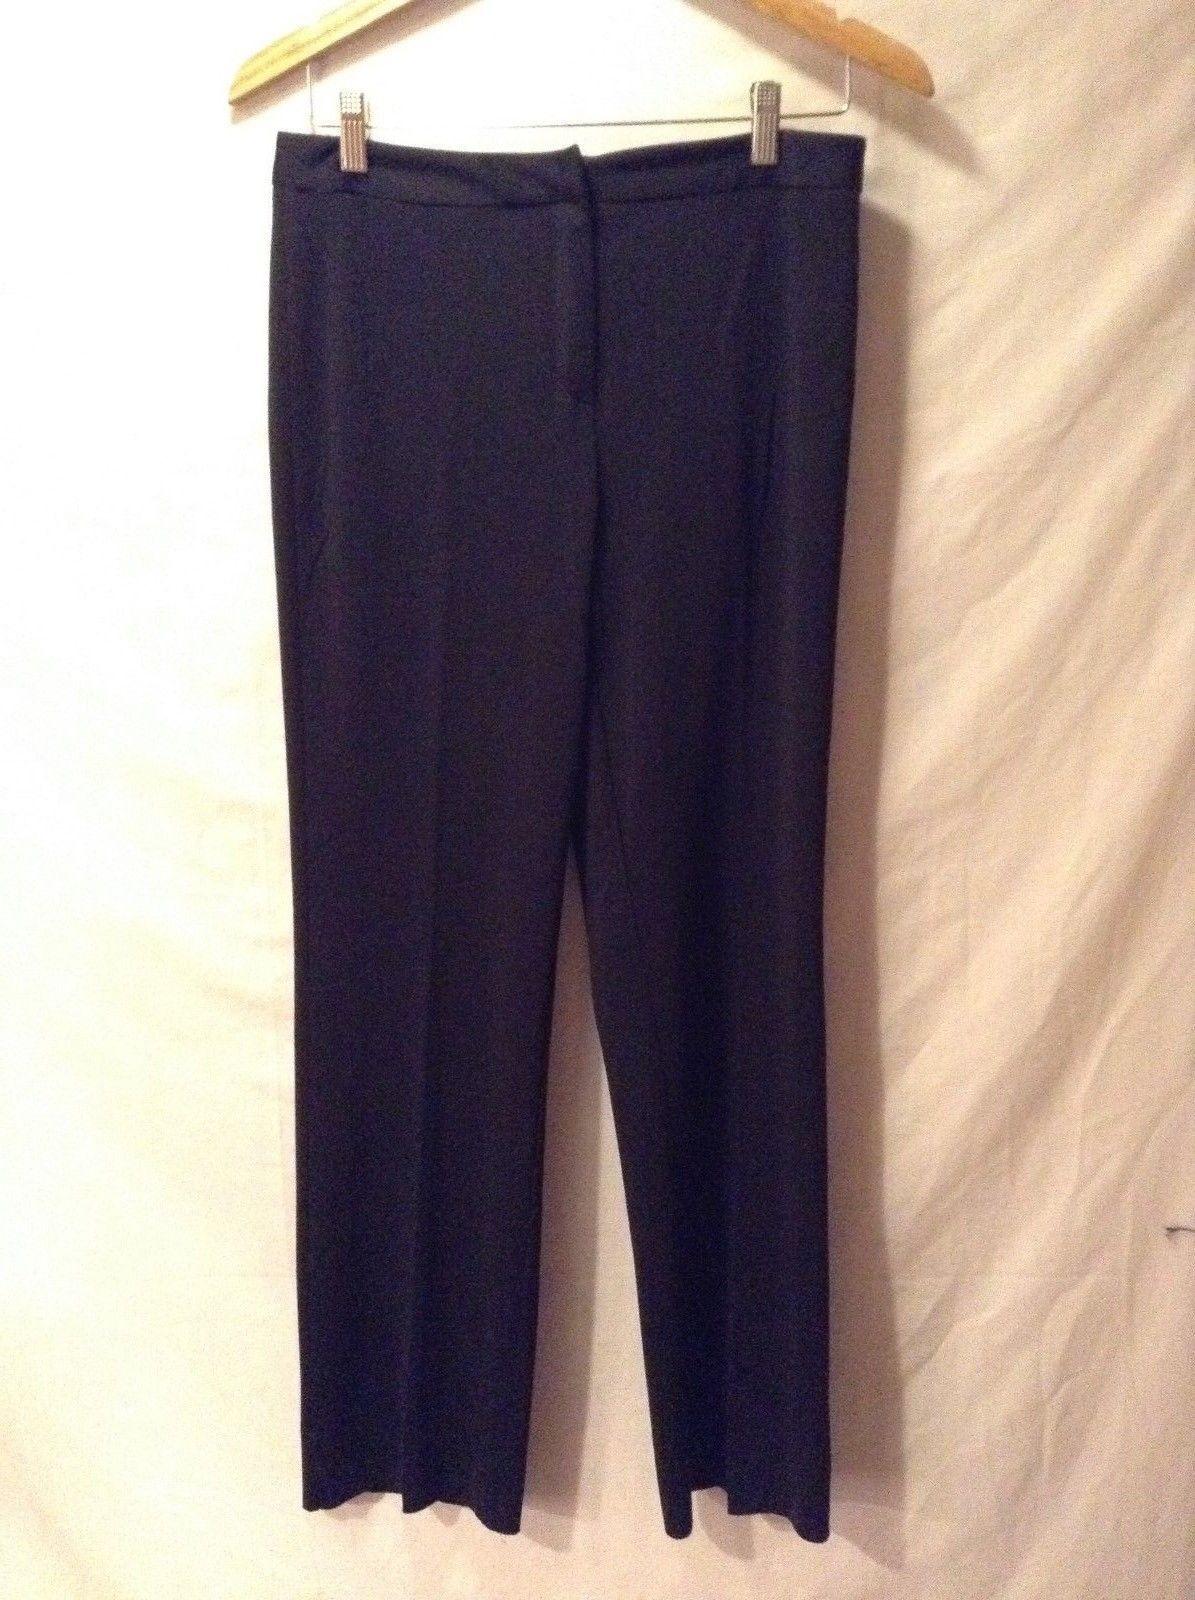 MODA International Black Dress Pants Sz 8